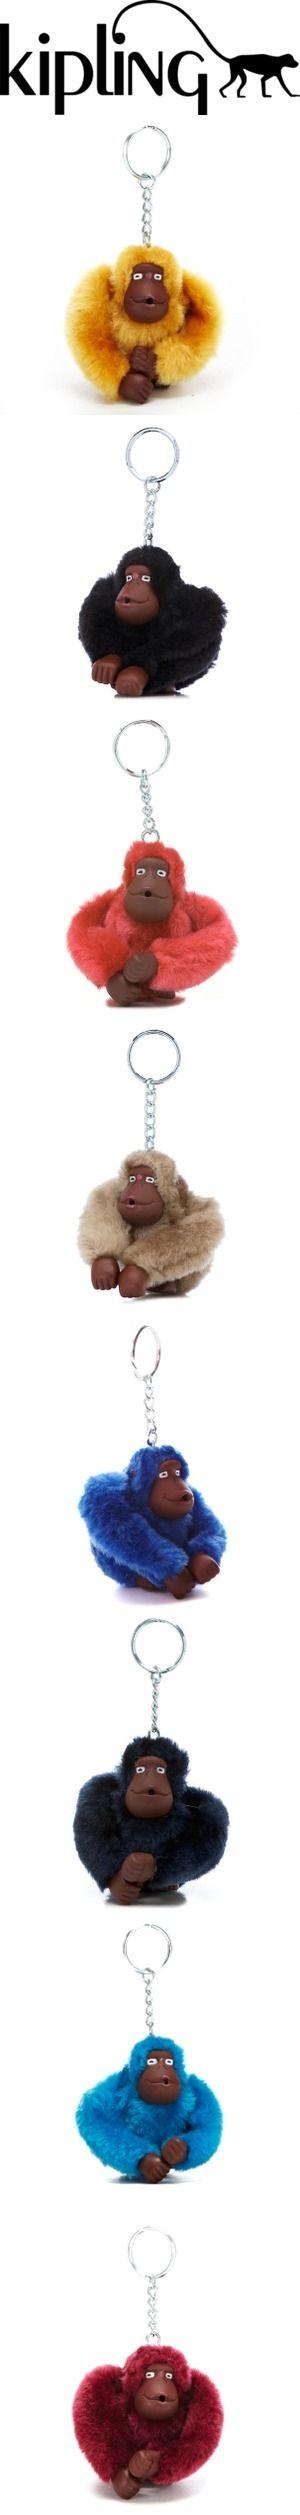 Pick your cool Kipling bag and then choose your monkey...Ask @Kipling International if I am making it up...